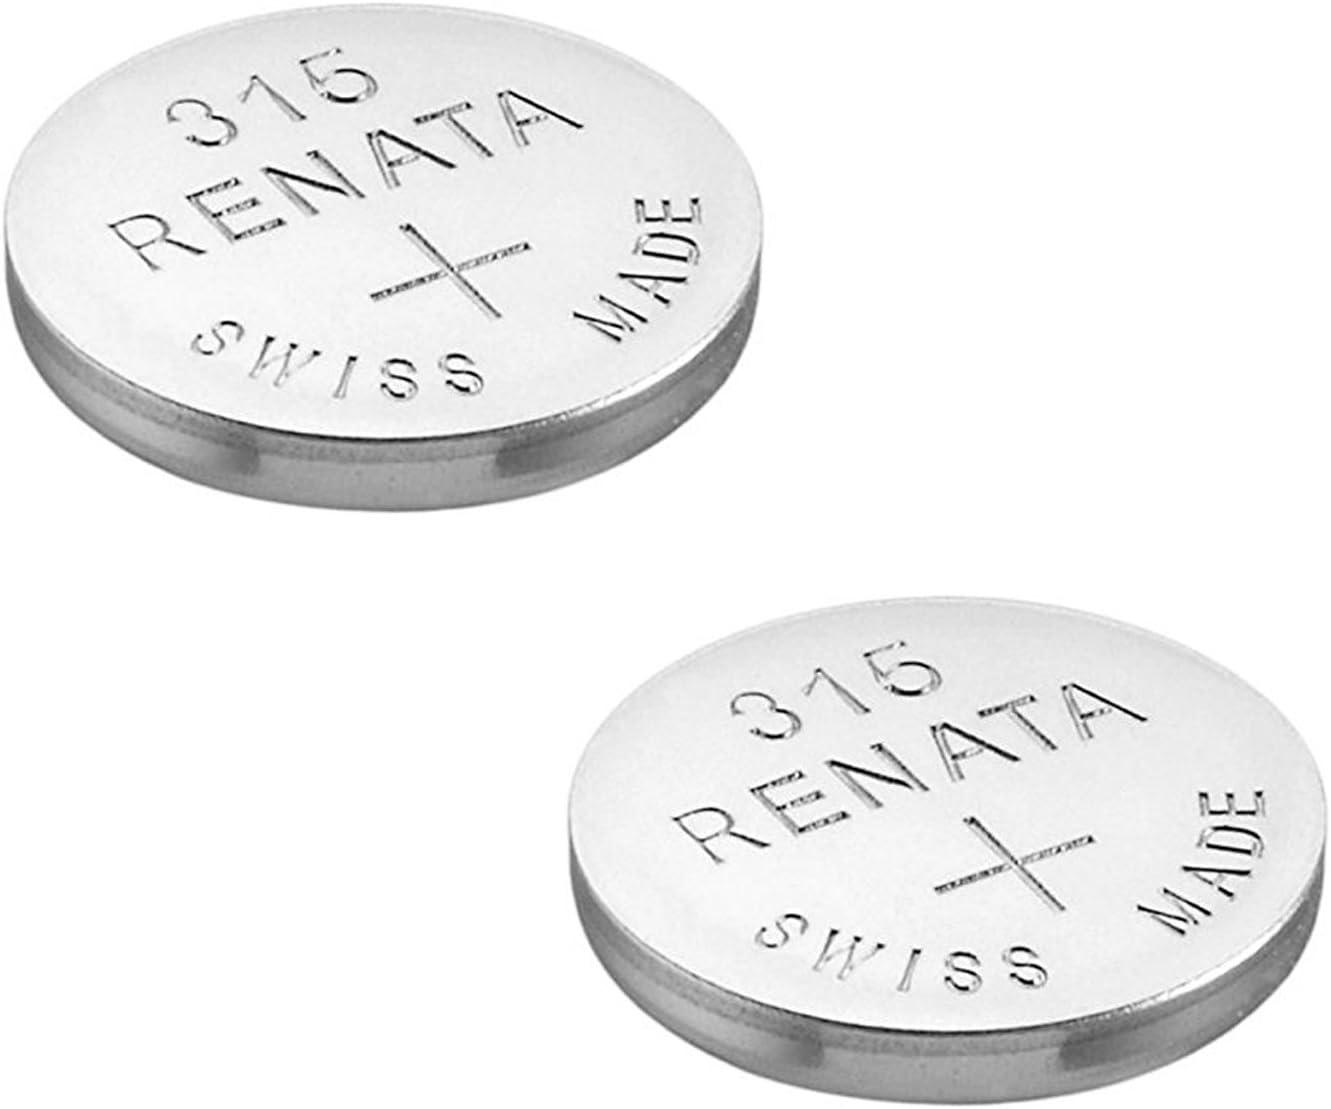 Renata 2 X 315 Uhren Batterie In Der Schweiz Elektronik